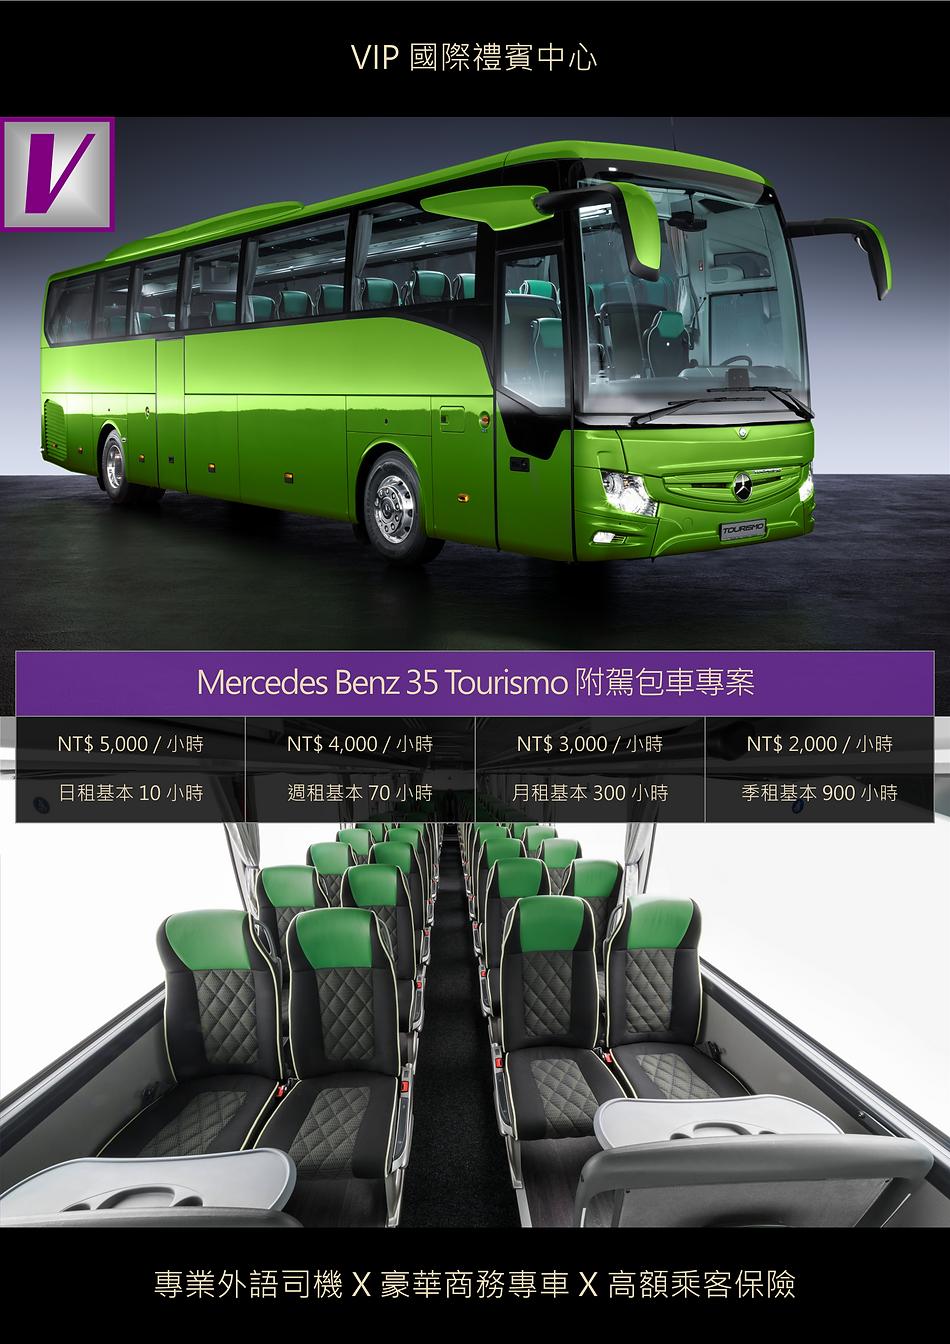 VIP國際禮賓中心 MERCEDES BENZ 35 TOURISMO 附駕包車專案 DM.png